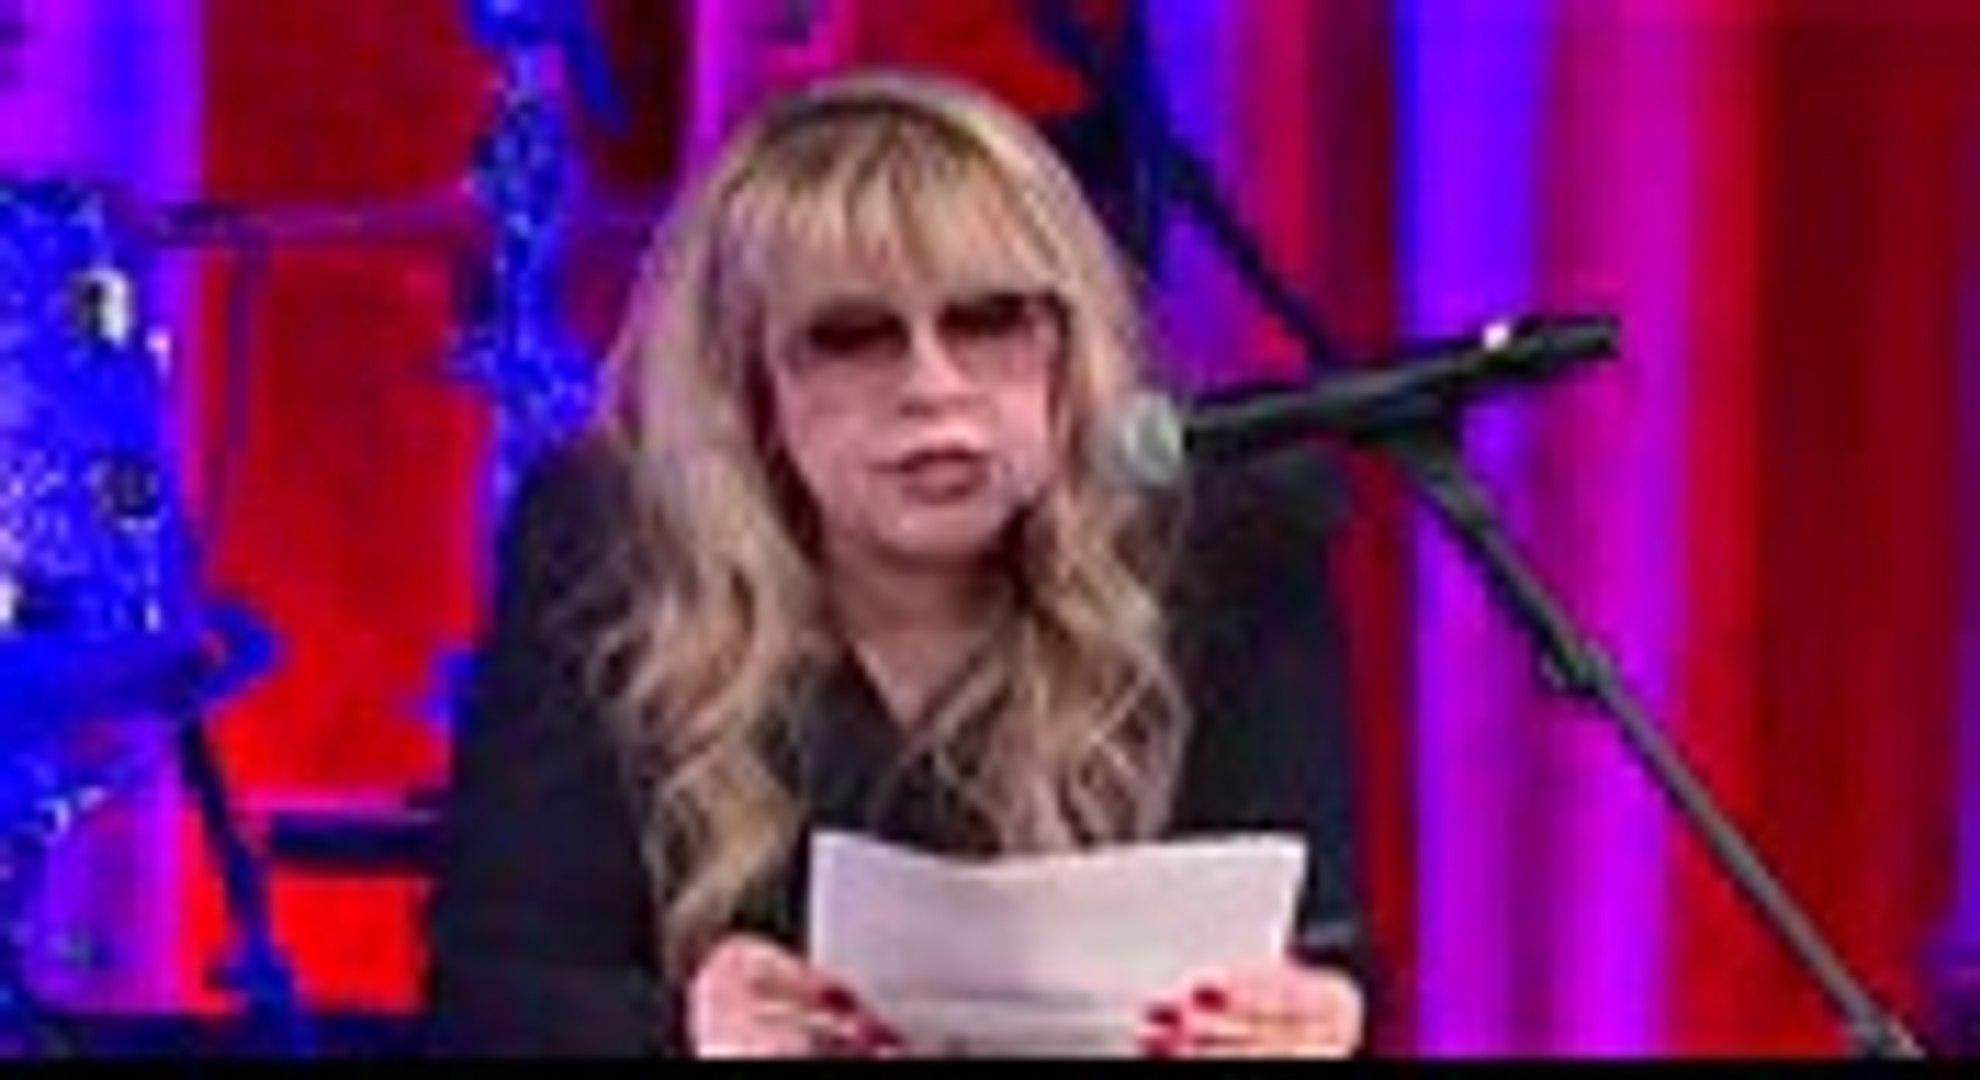 Stevie Nicks Accepts the BMI Icon Award